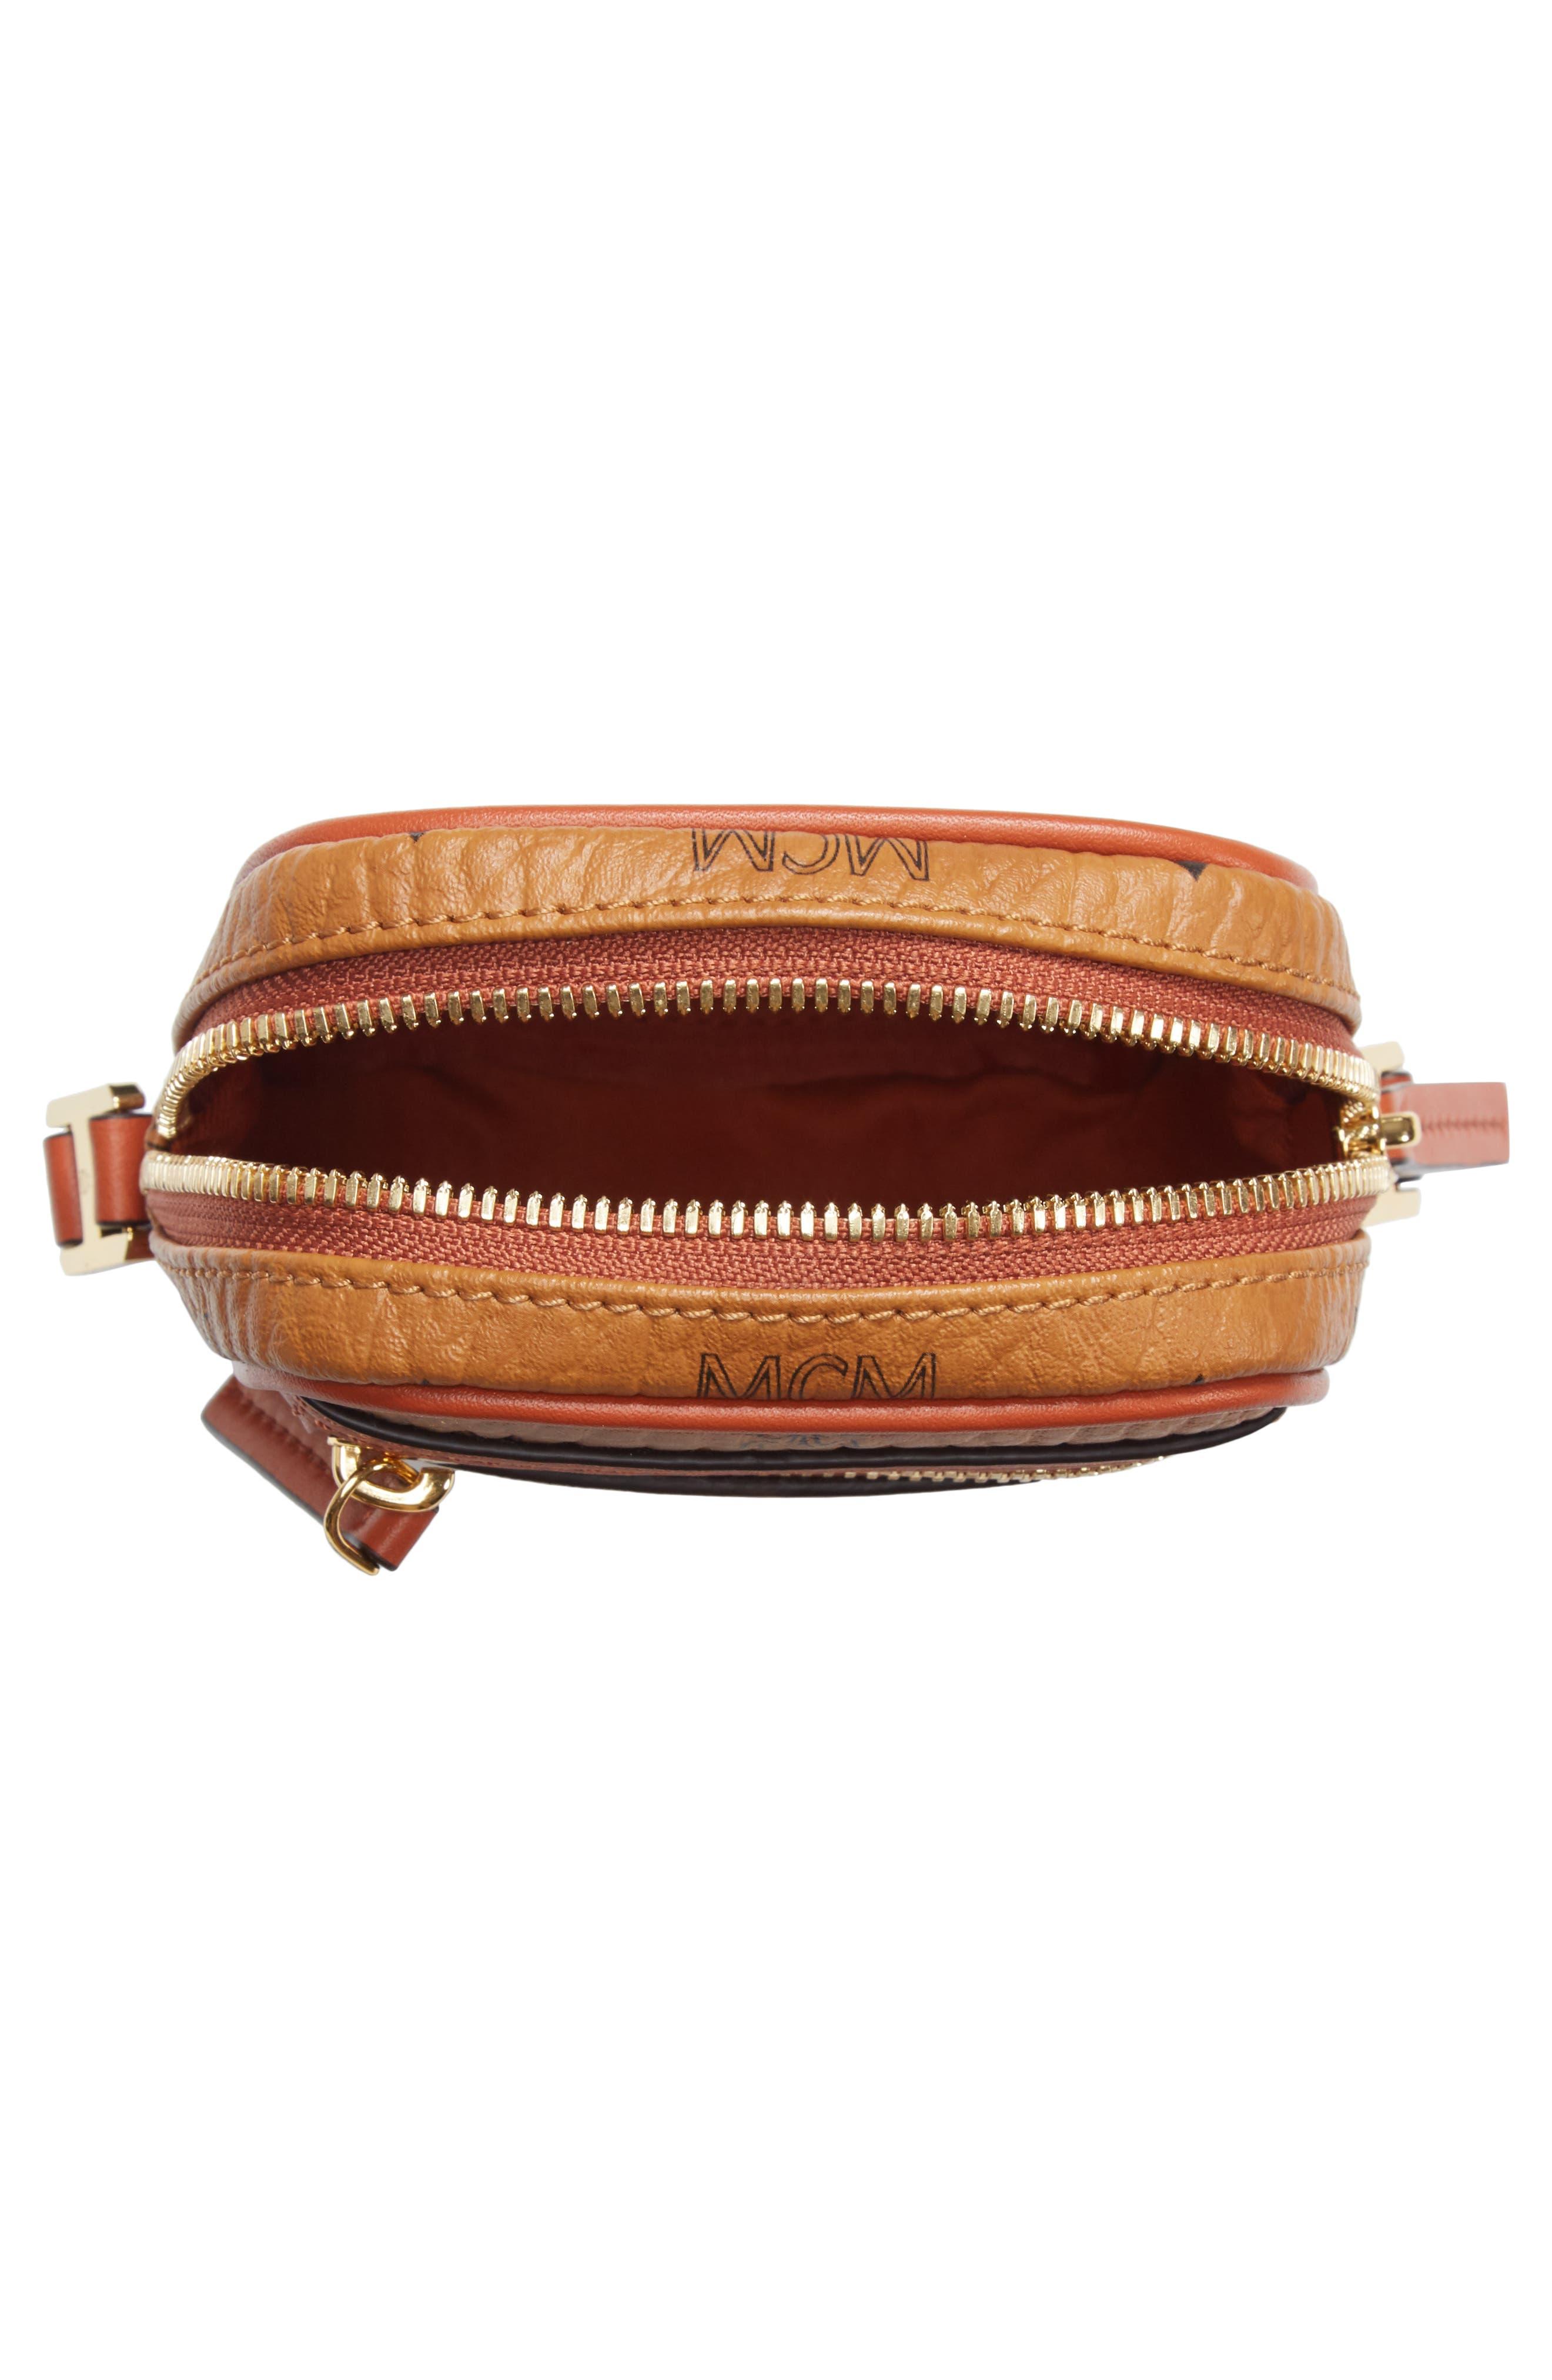 Mini Vintage Crossbody Bag,                             Alternate thumbnail 4, color,                             COGNAC